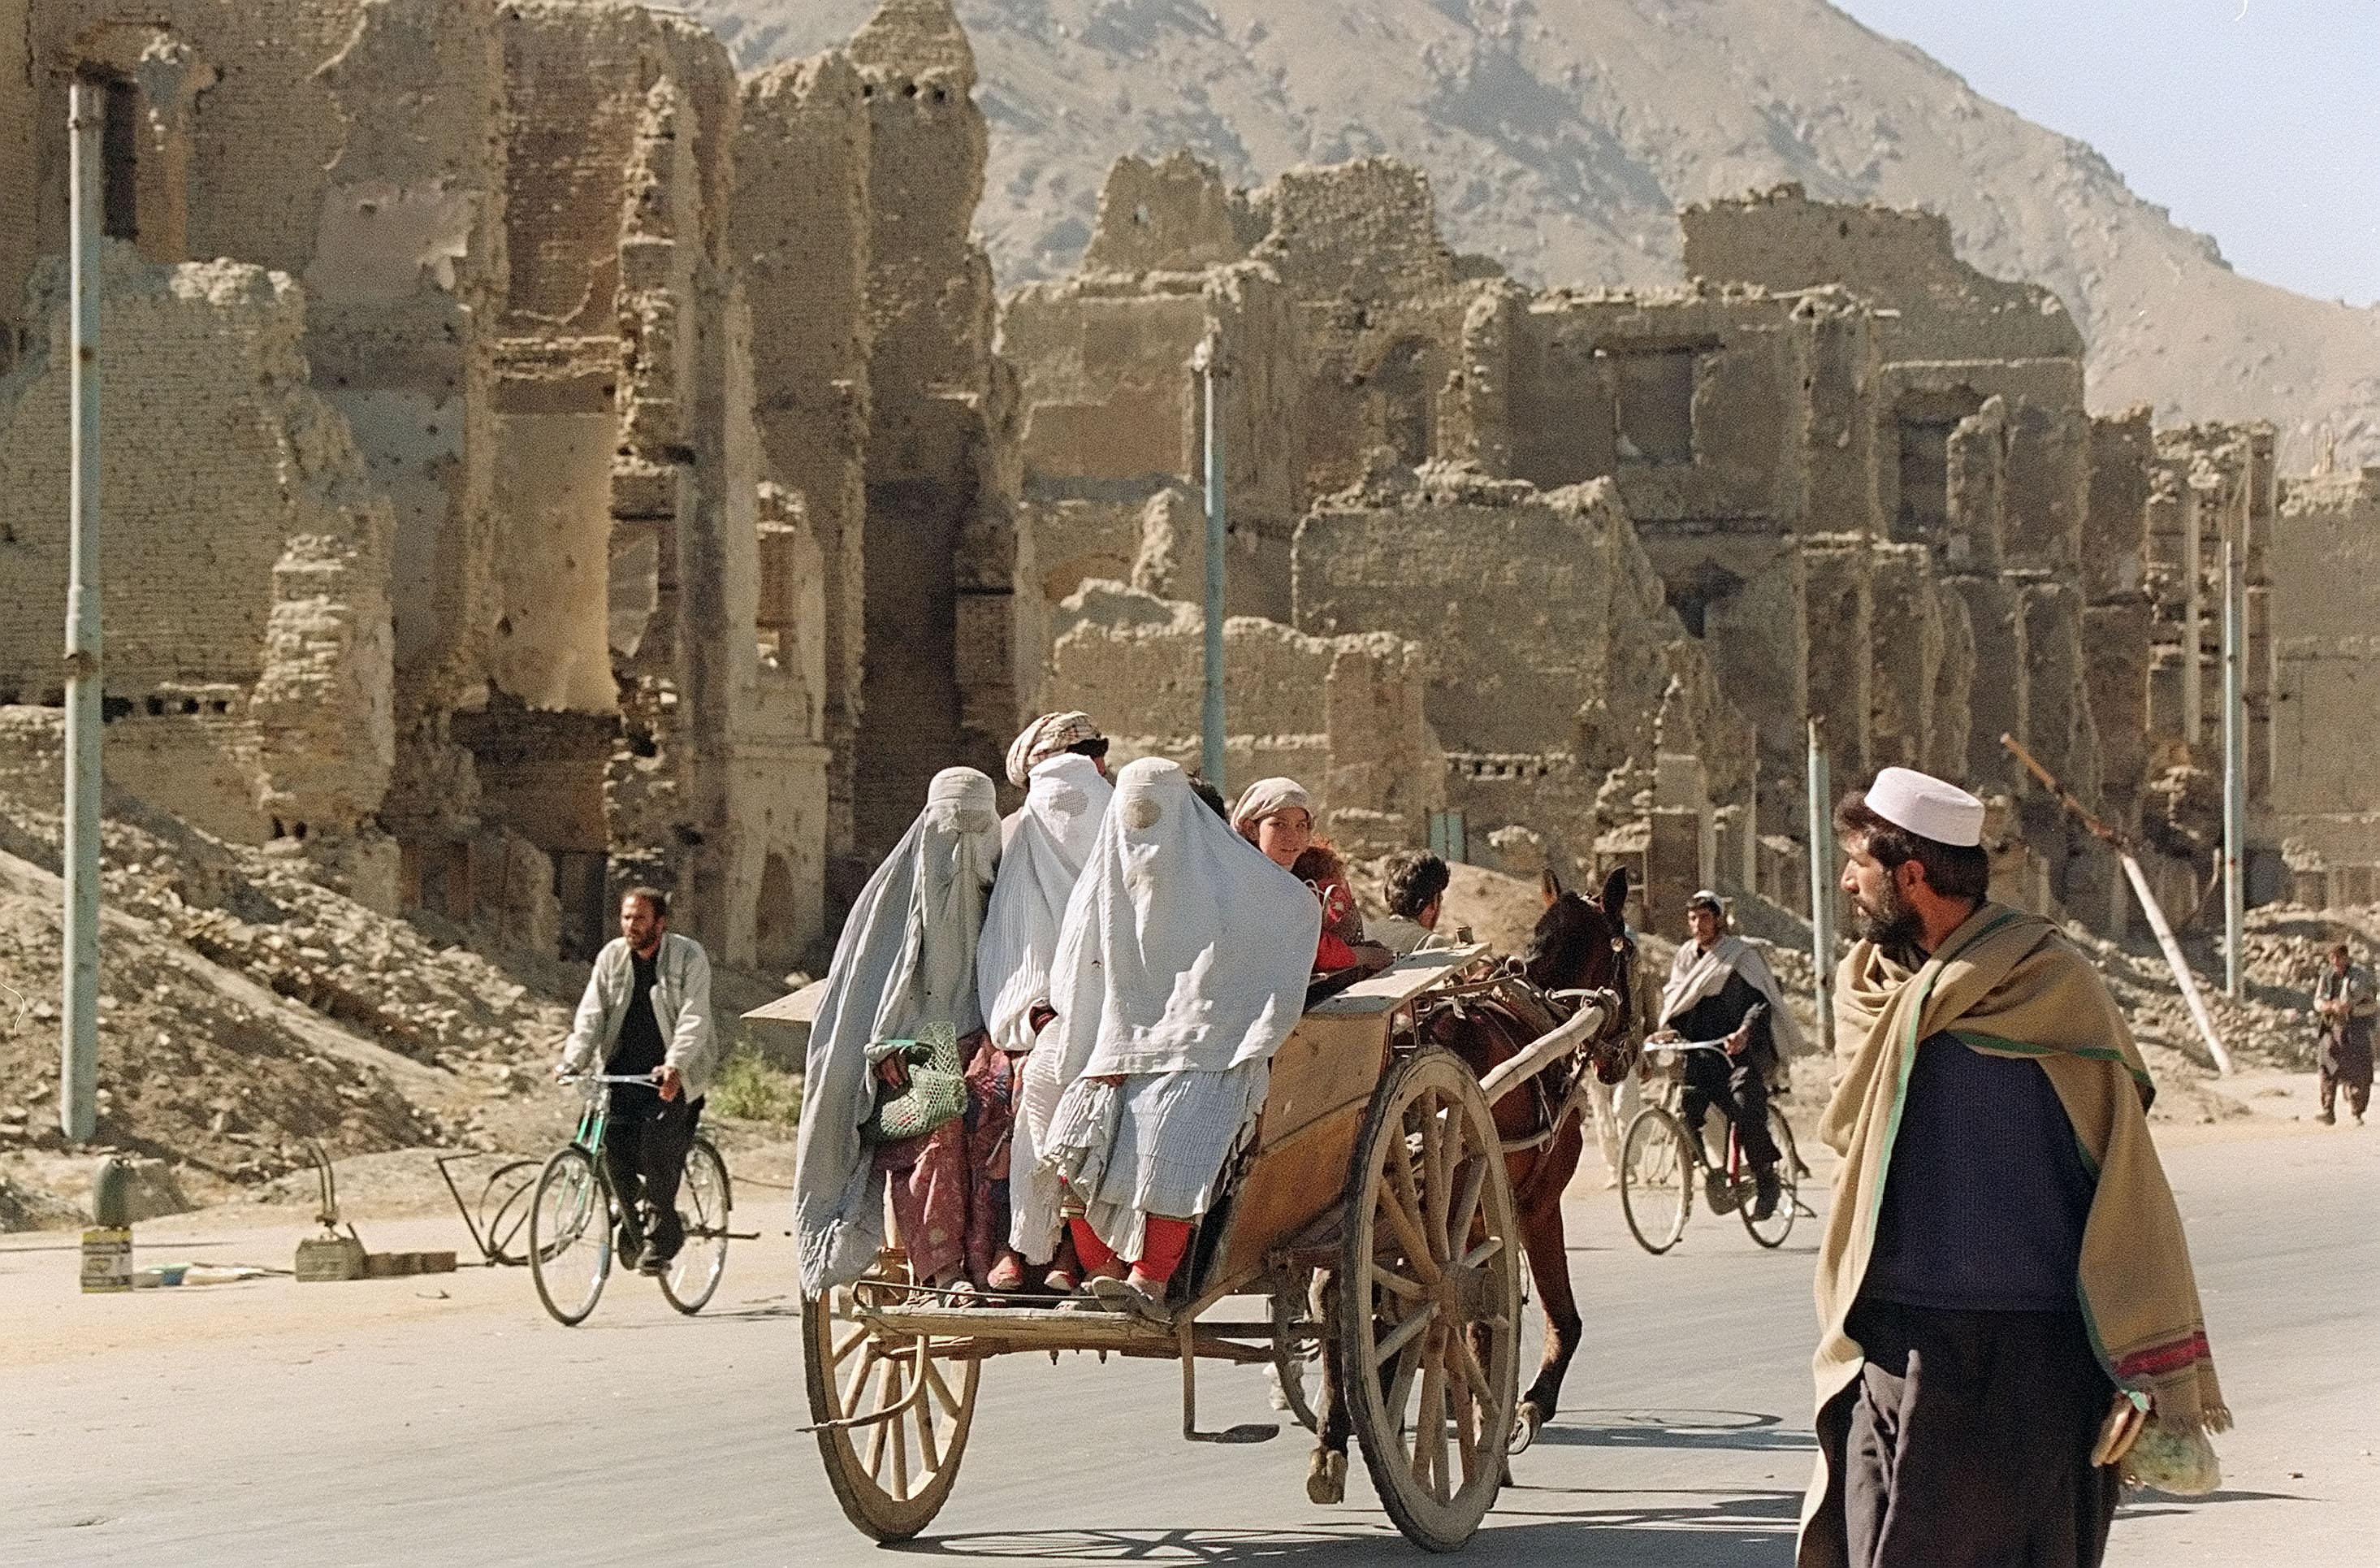 Сторонники движения «Талибан» на подходе к Кабулу, Афганистан. 3 октября 1996